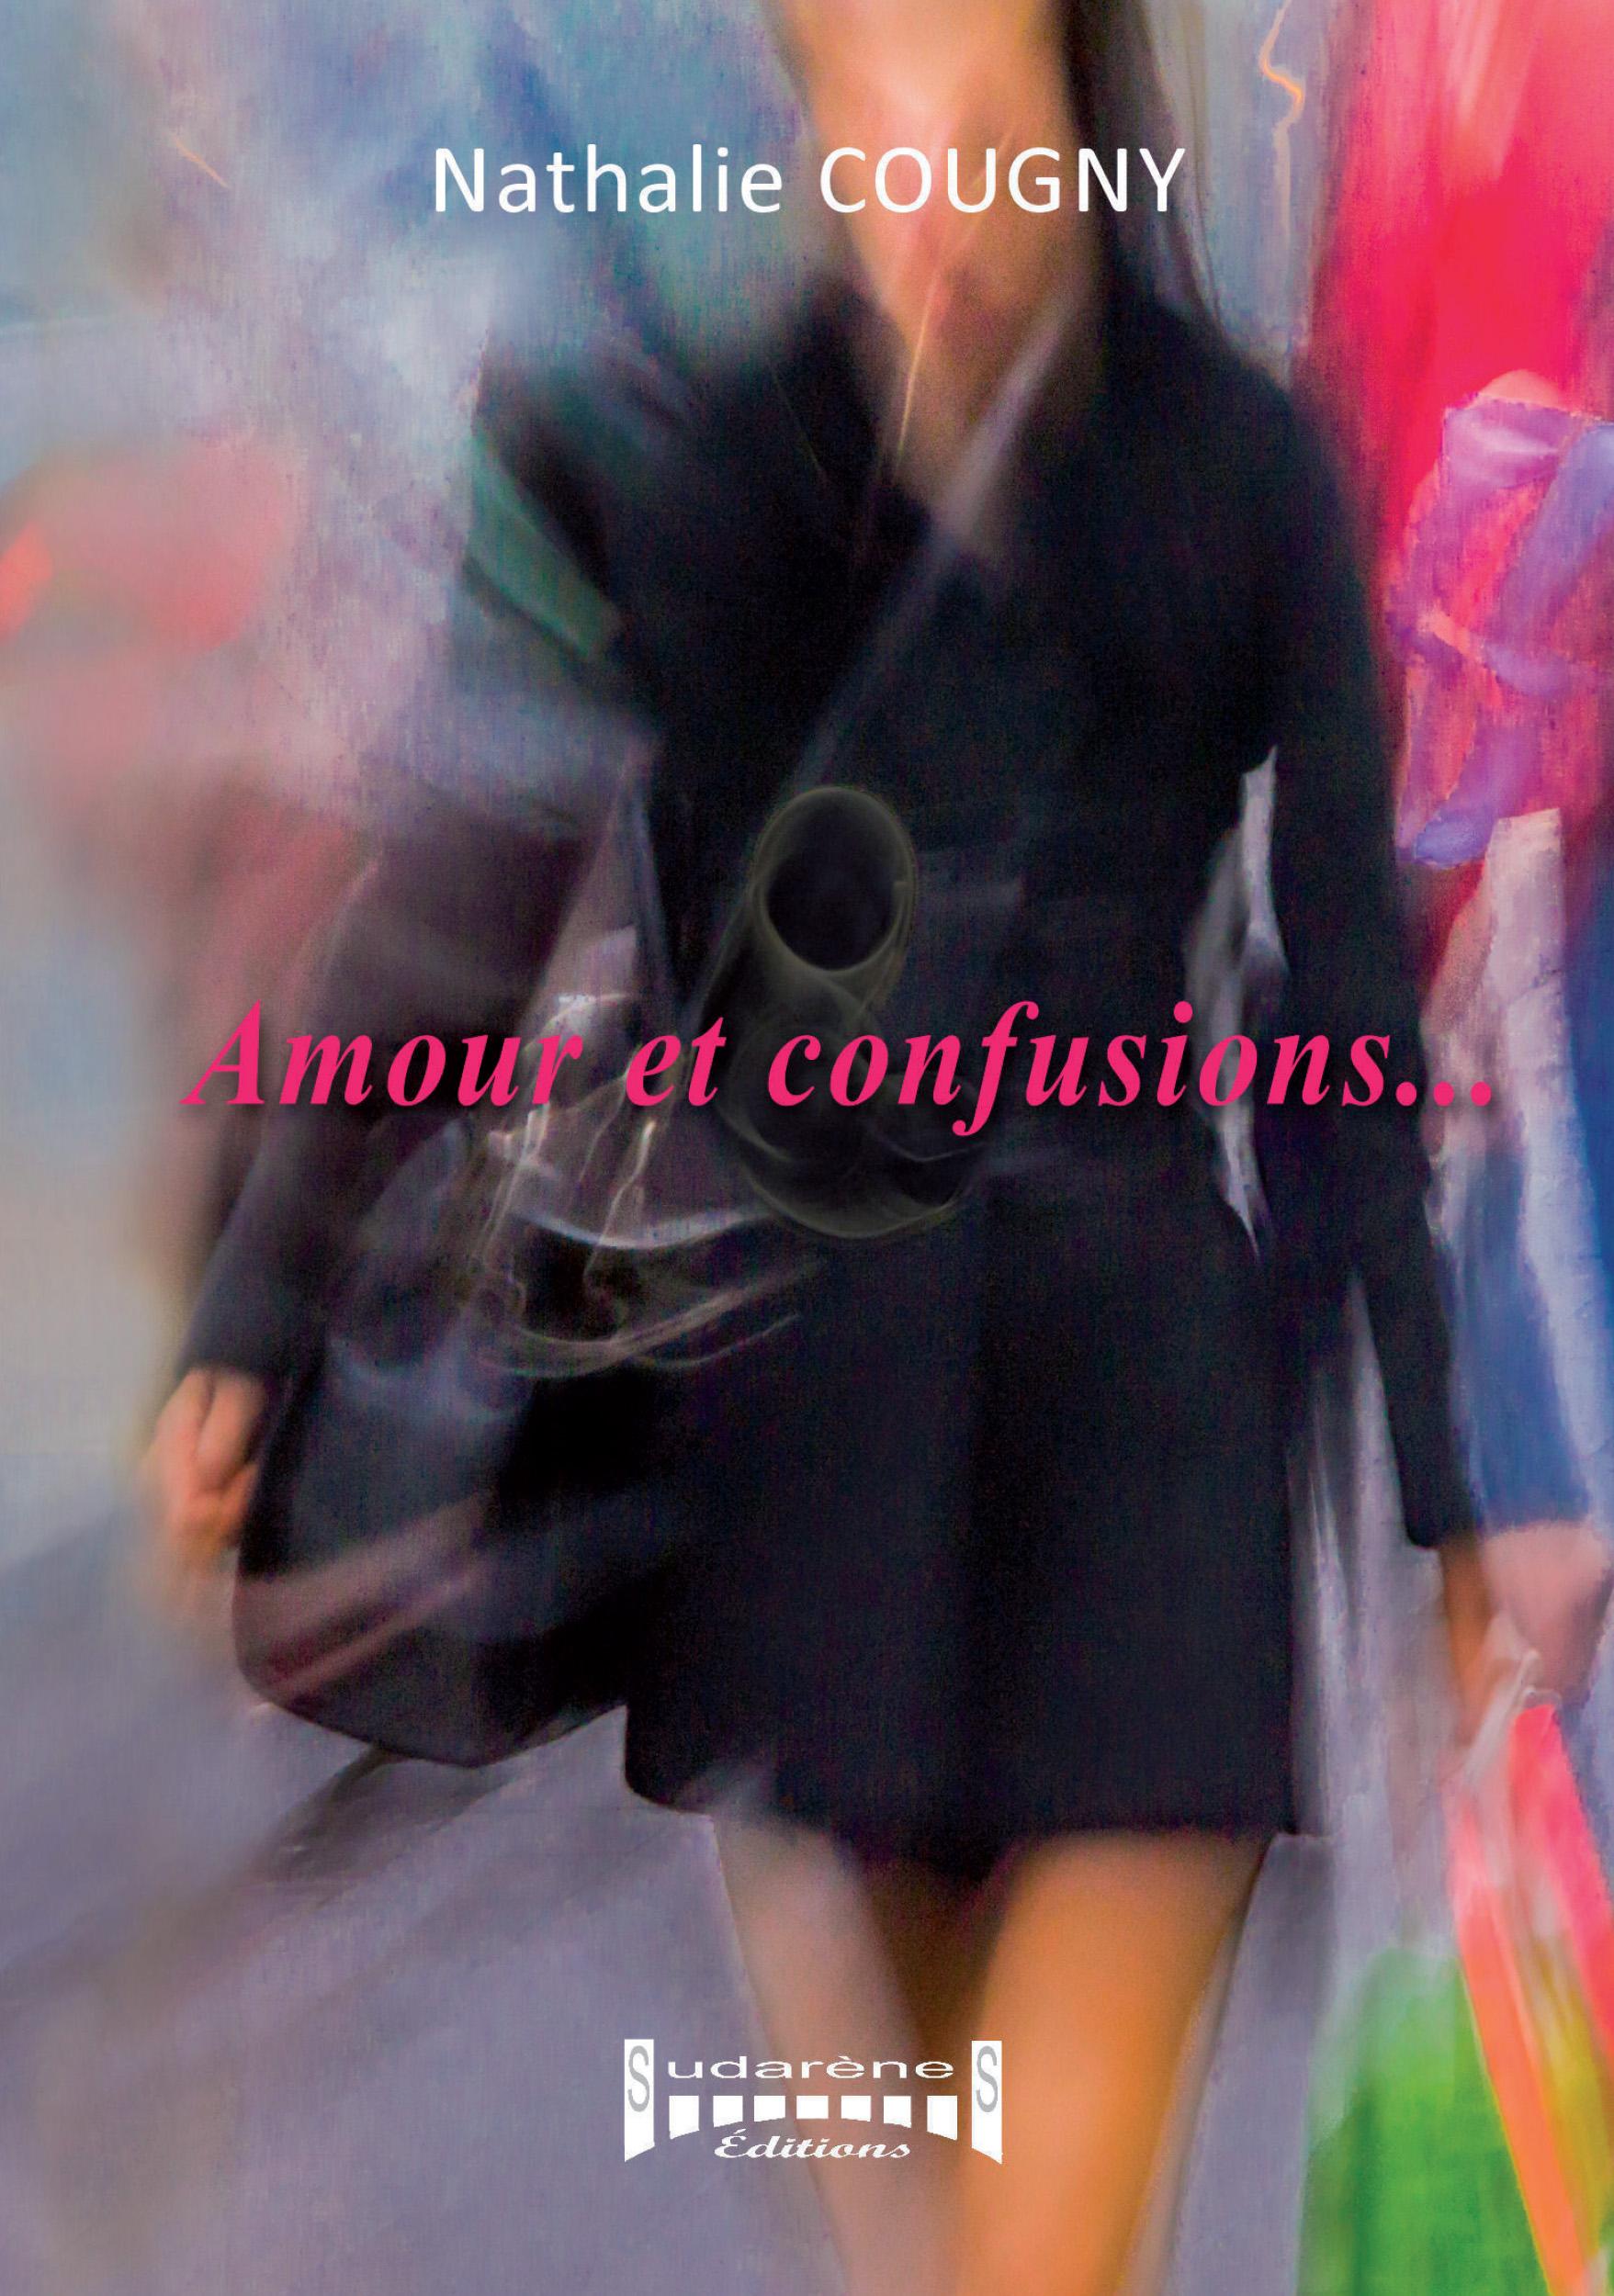 Amour et confusions…